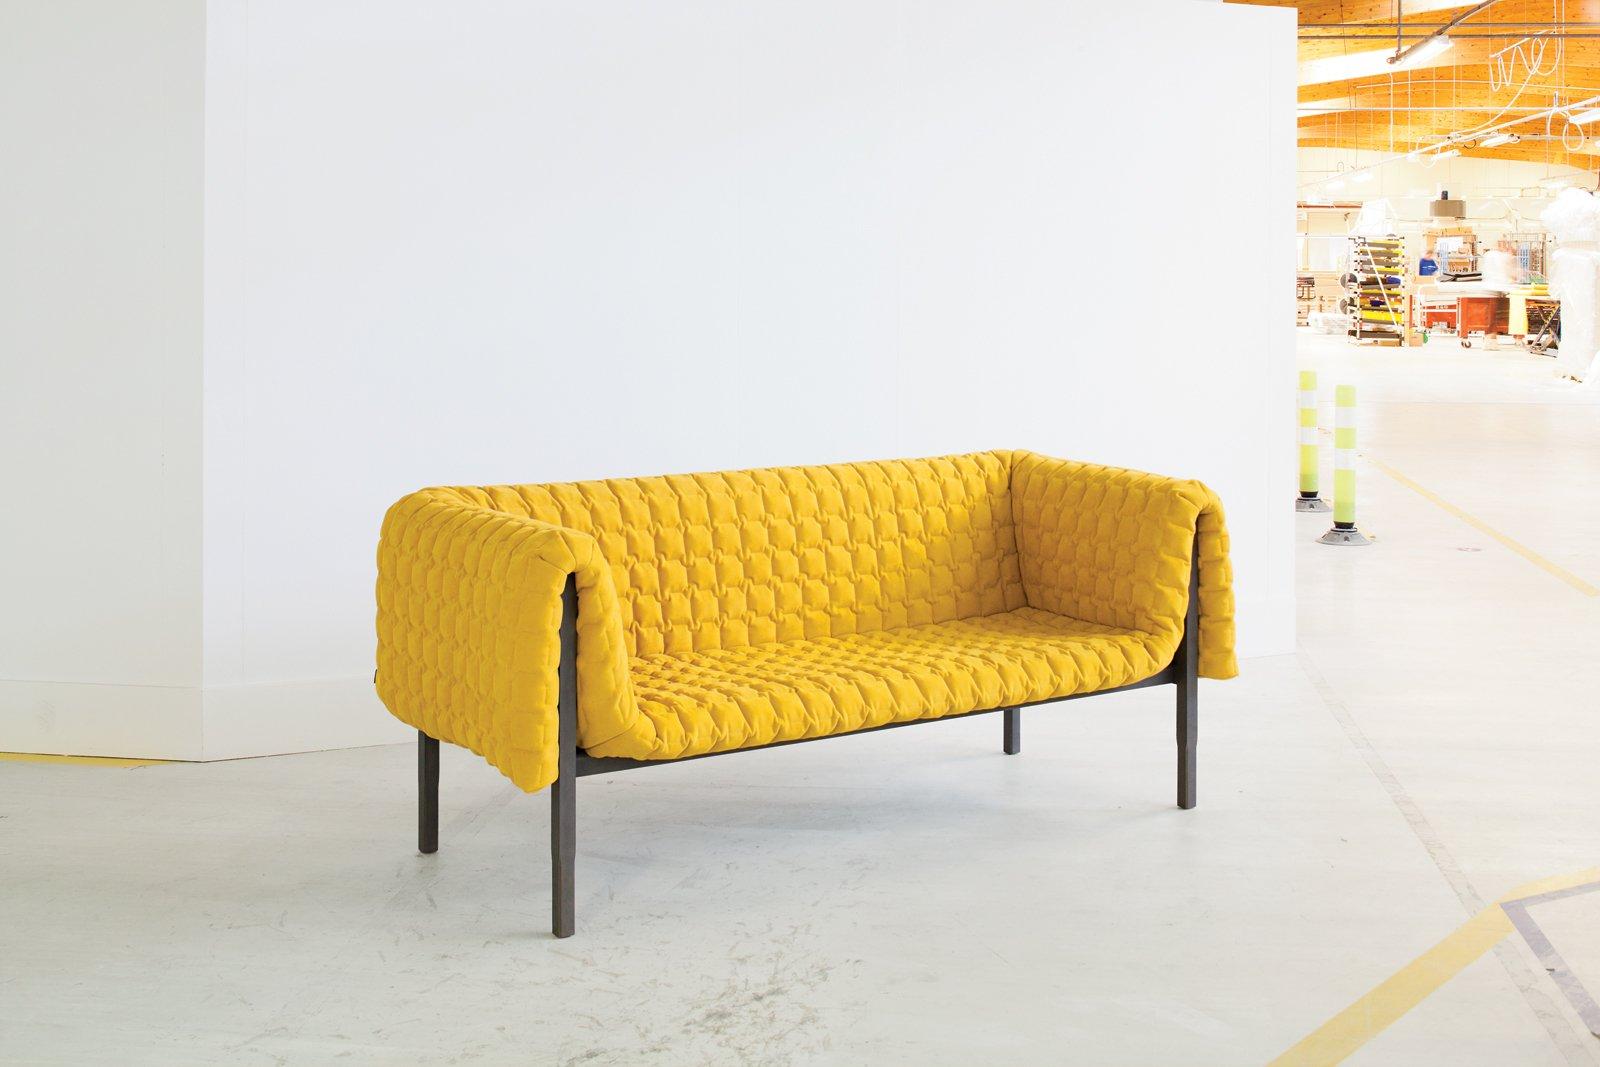 ruch sofa dwell. Black Bedroom Furniture Sets. Home Design Ideas